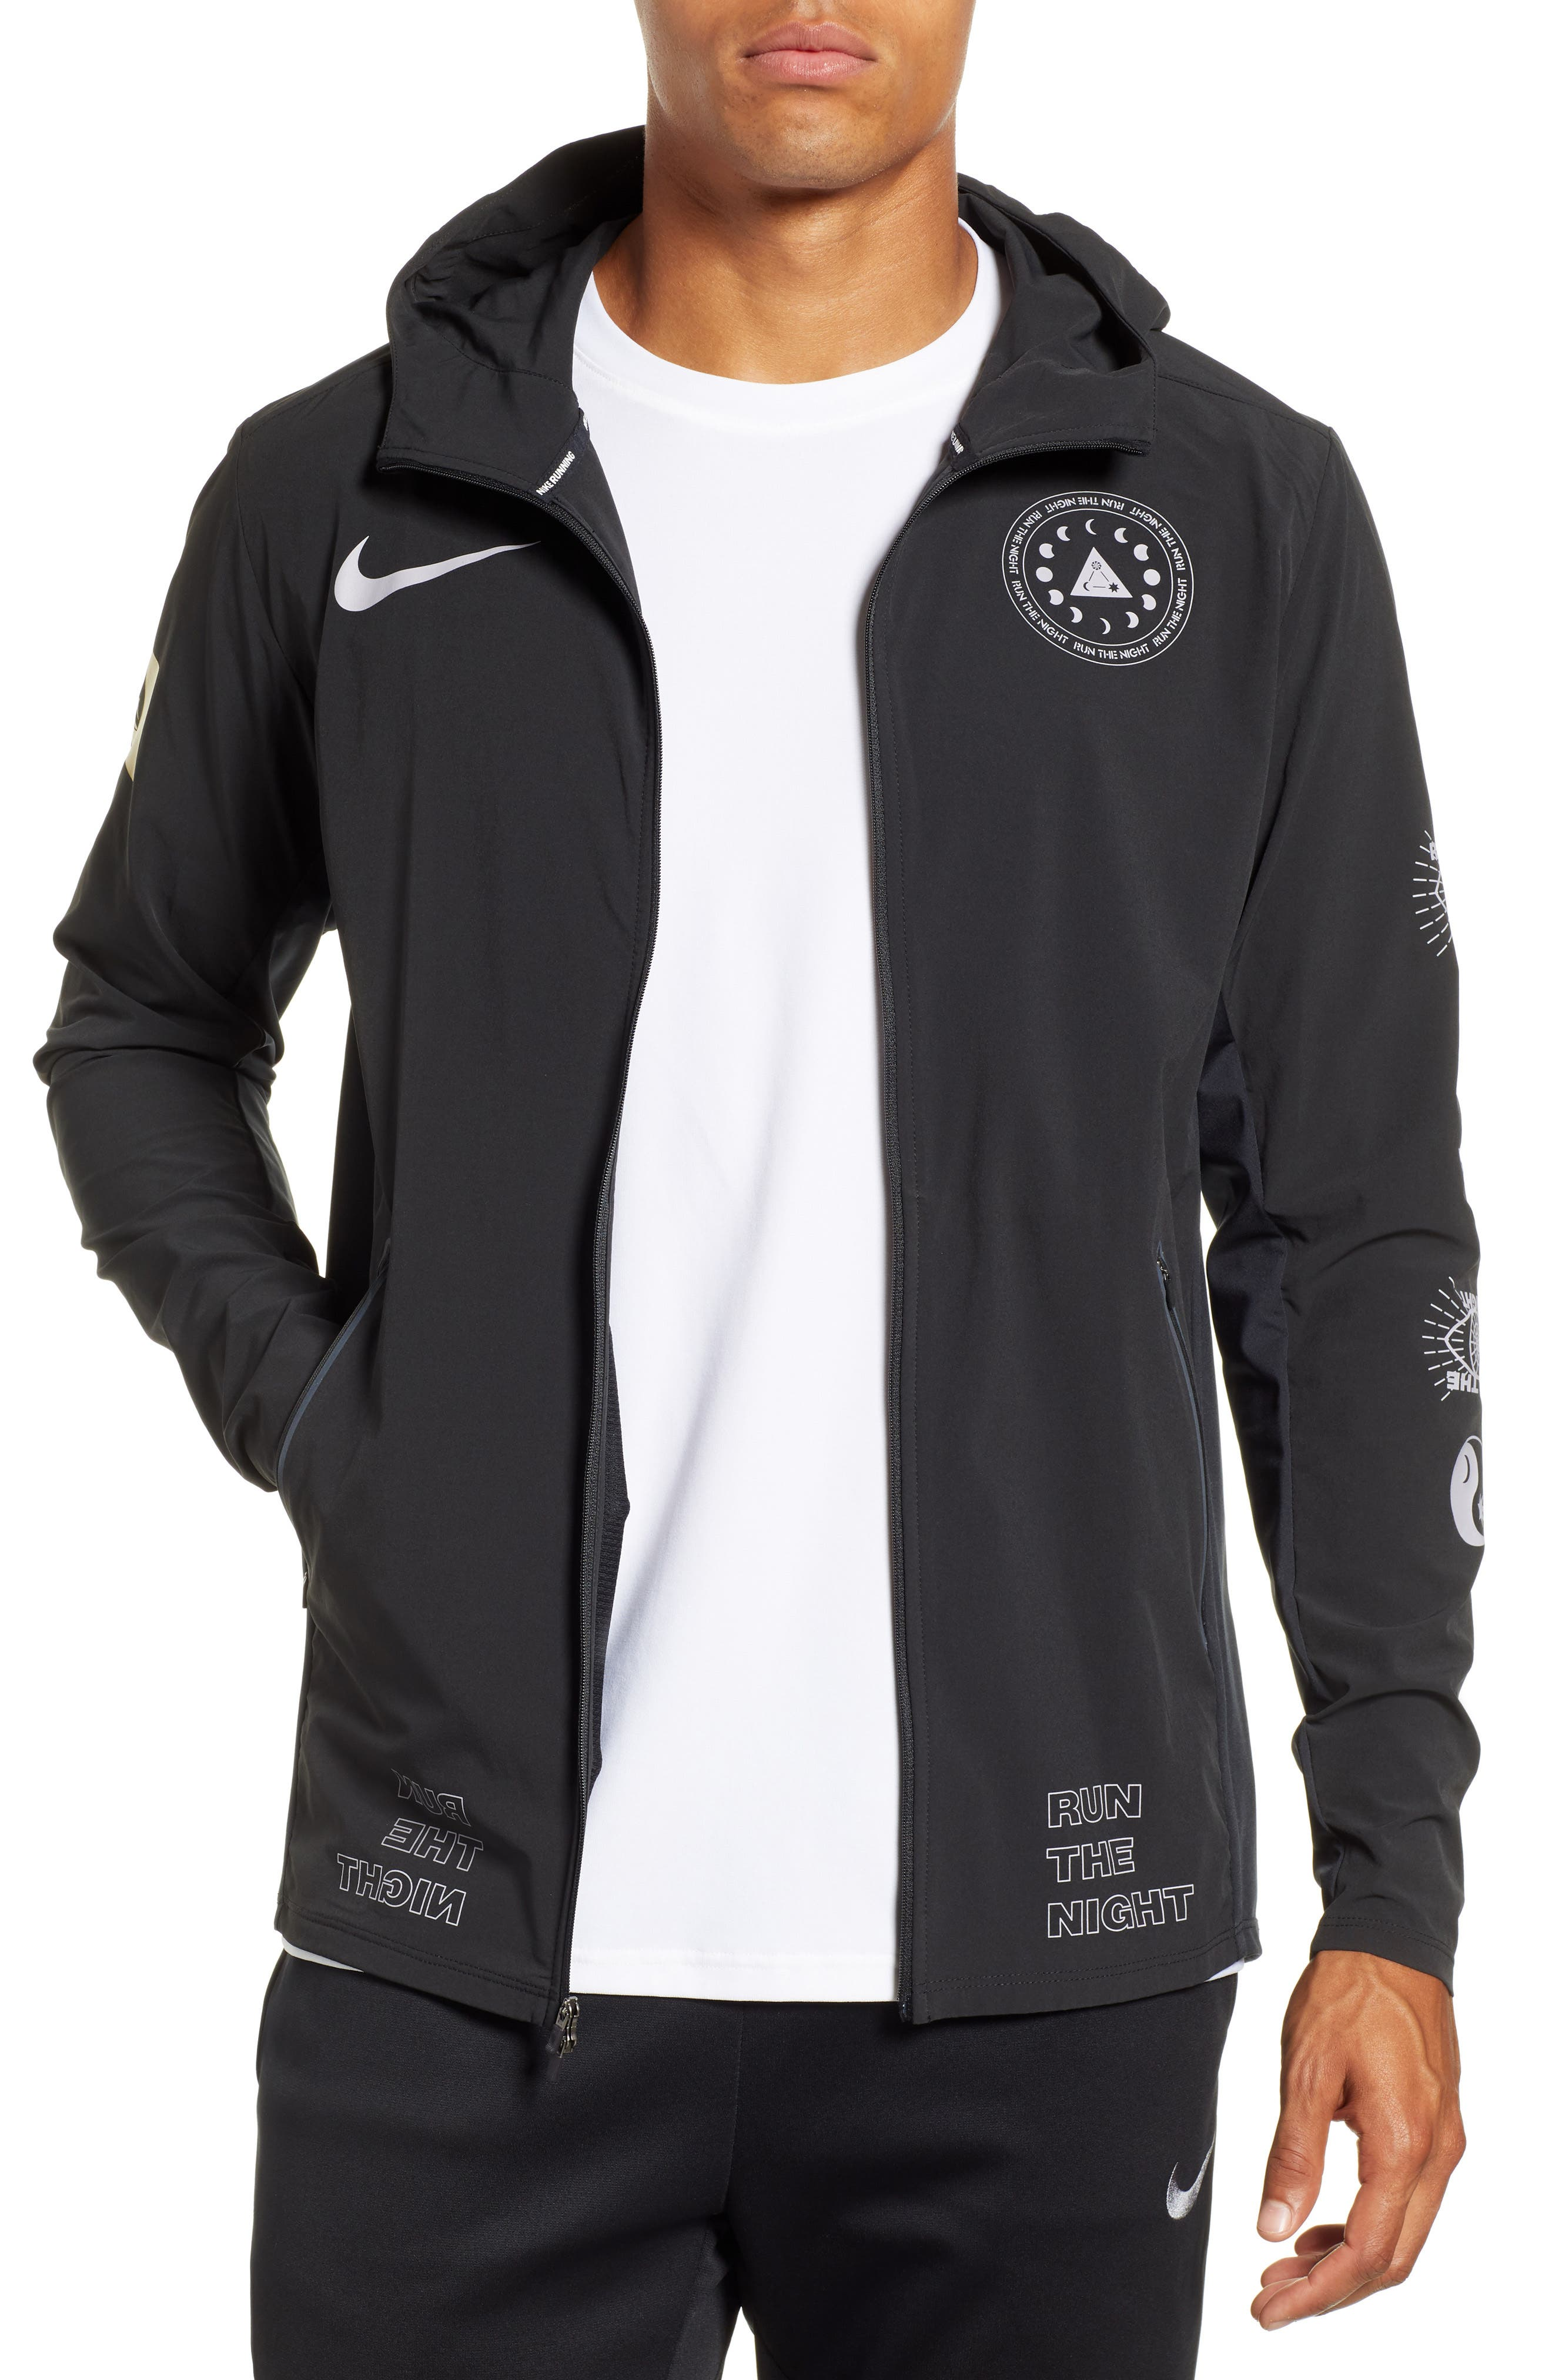 Winter Solstice Reflective Running Jacket,                         Main,                         color, BLACK/ PROVENCE PURPLE